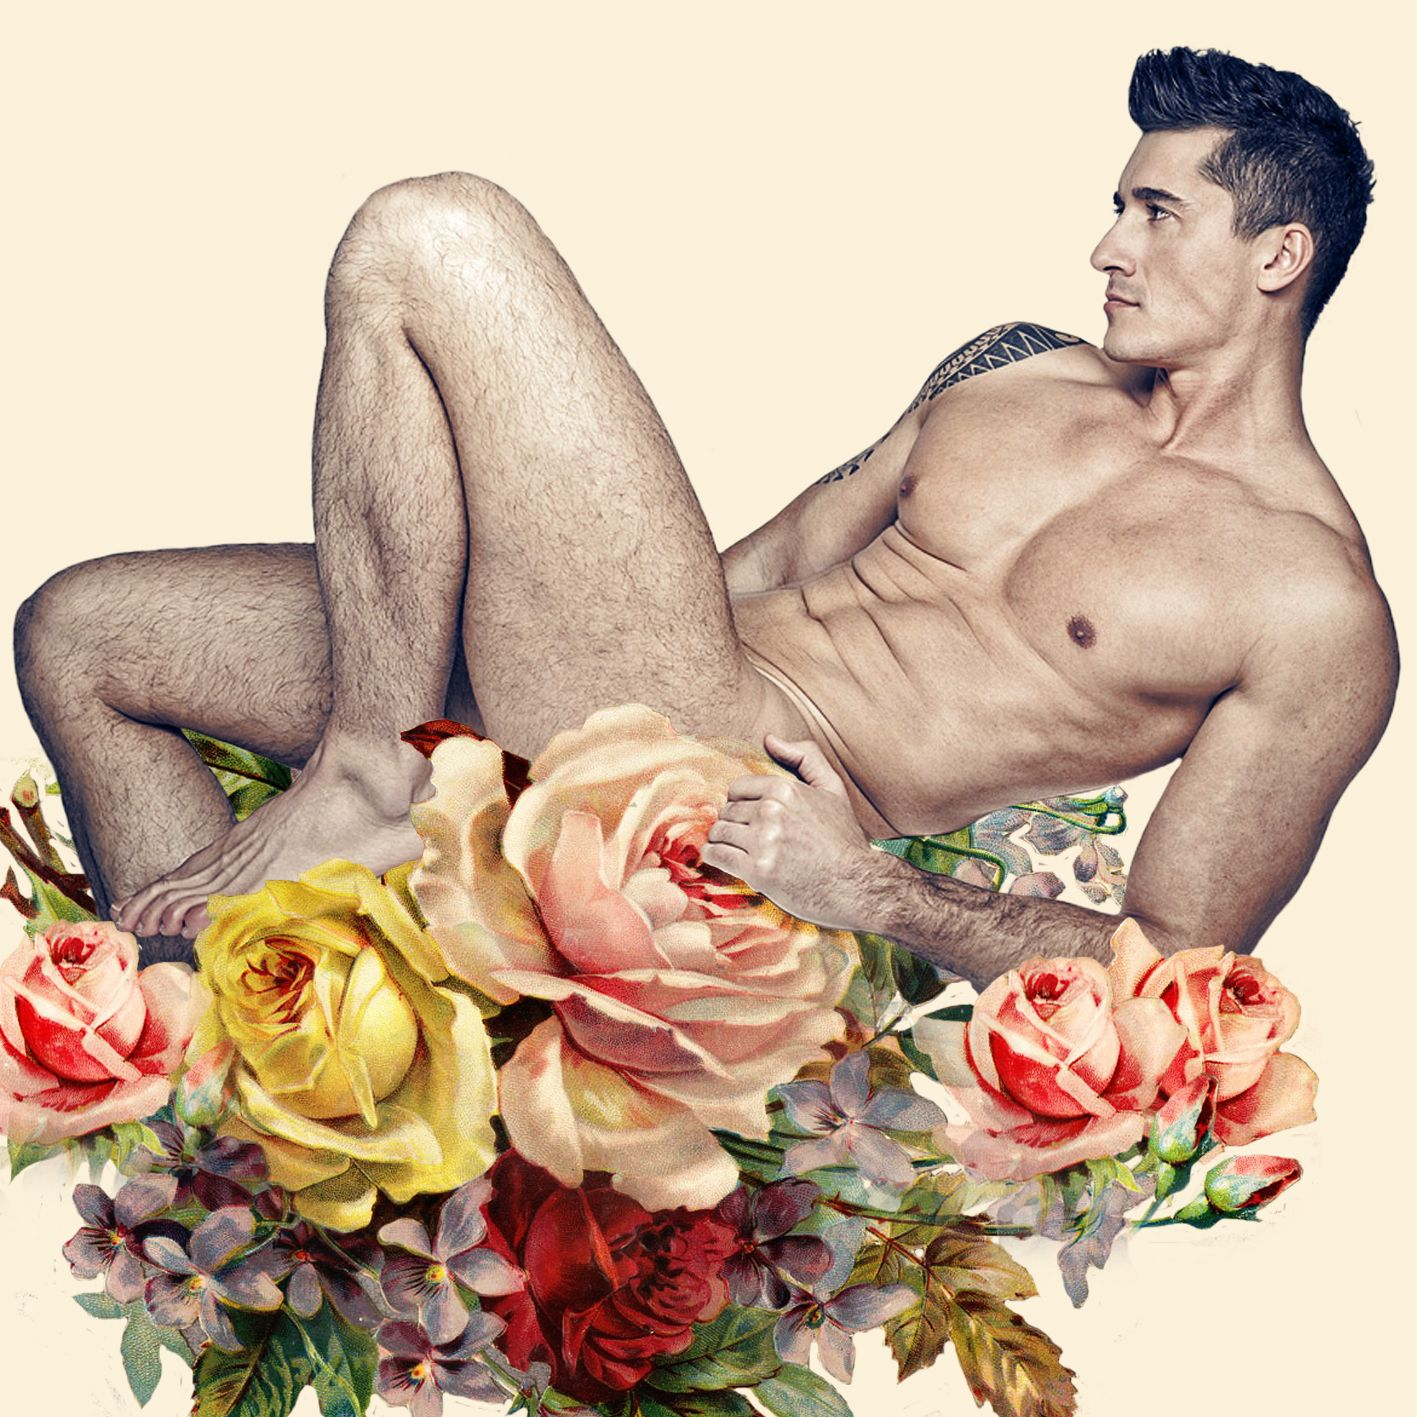 Flores vintage + corpo masculino